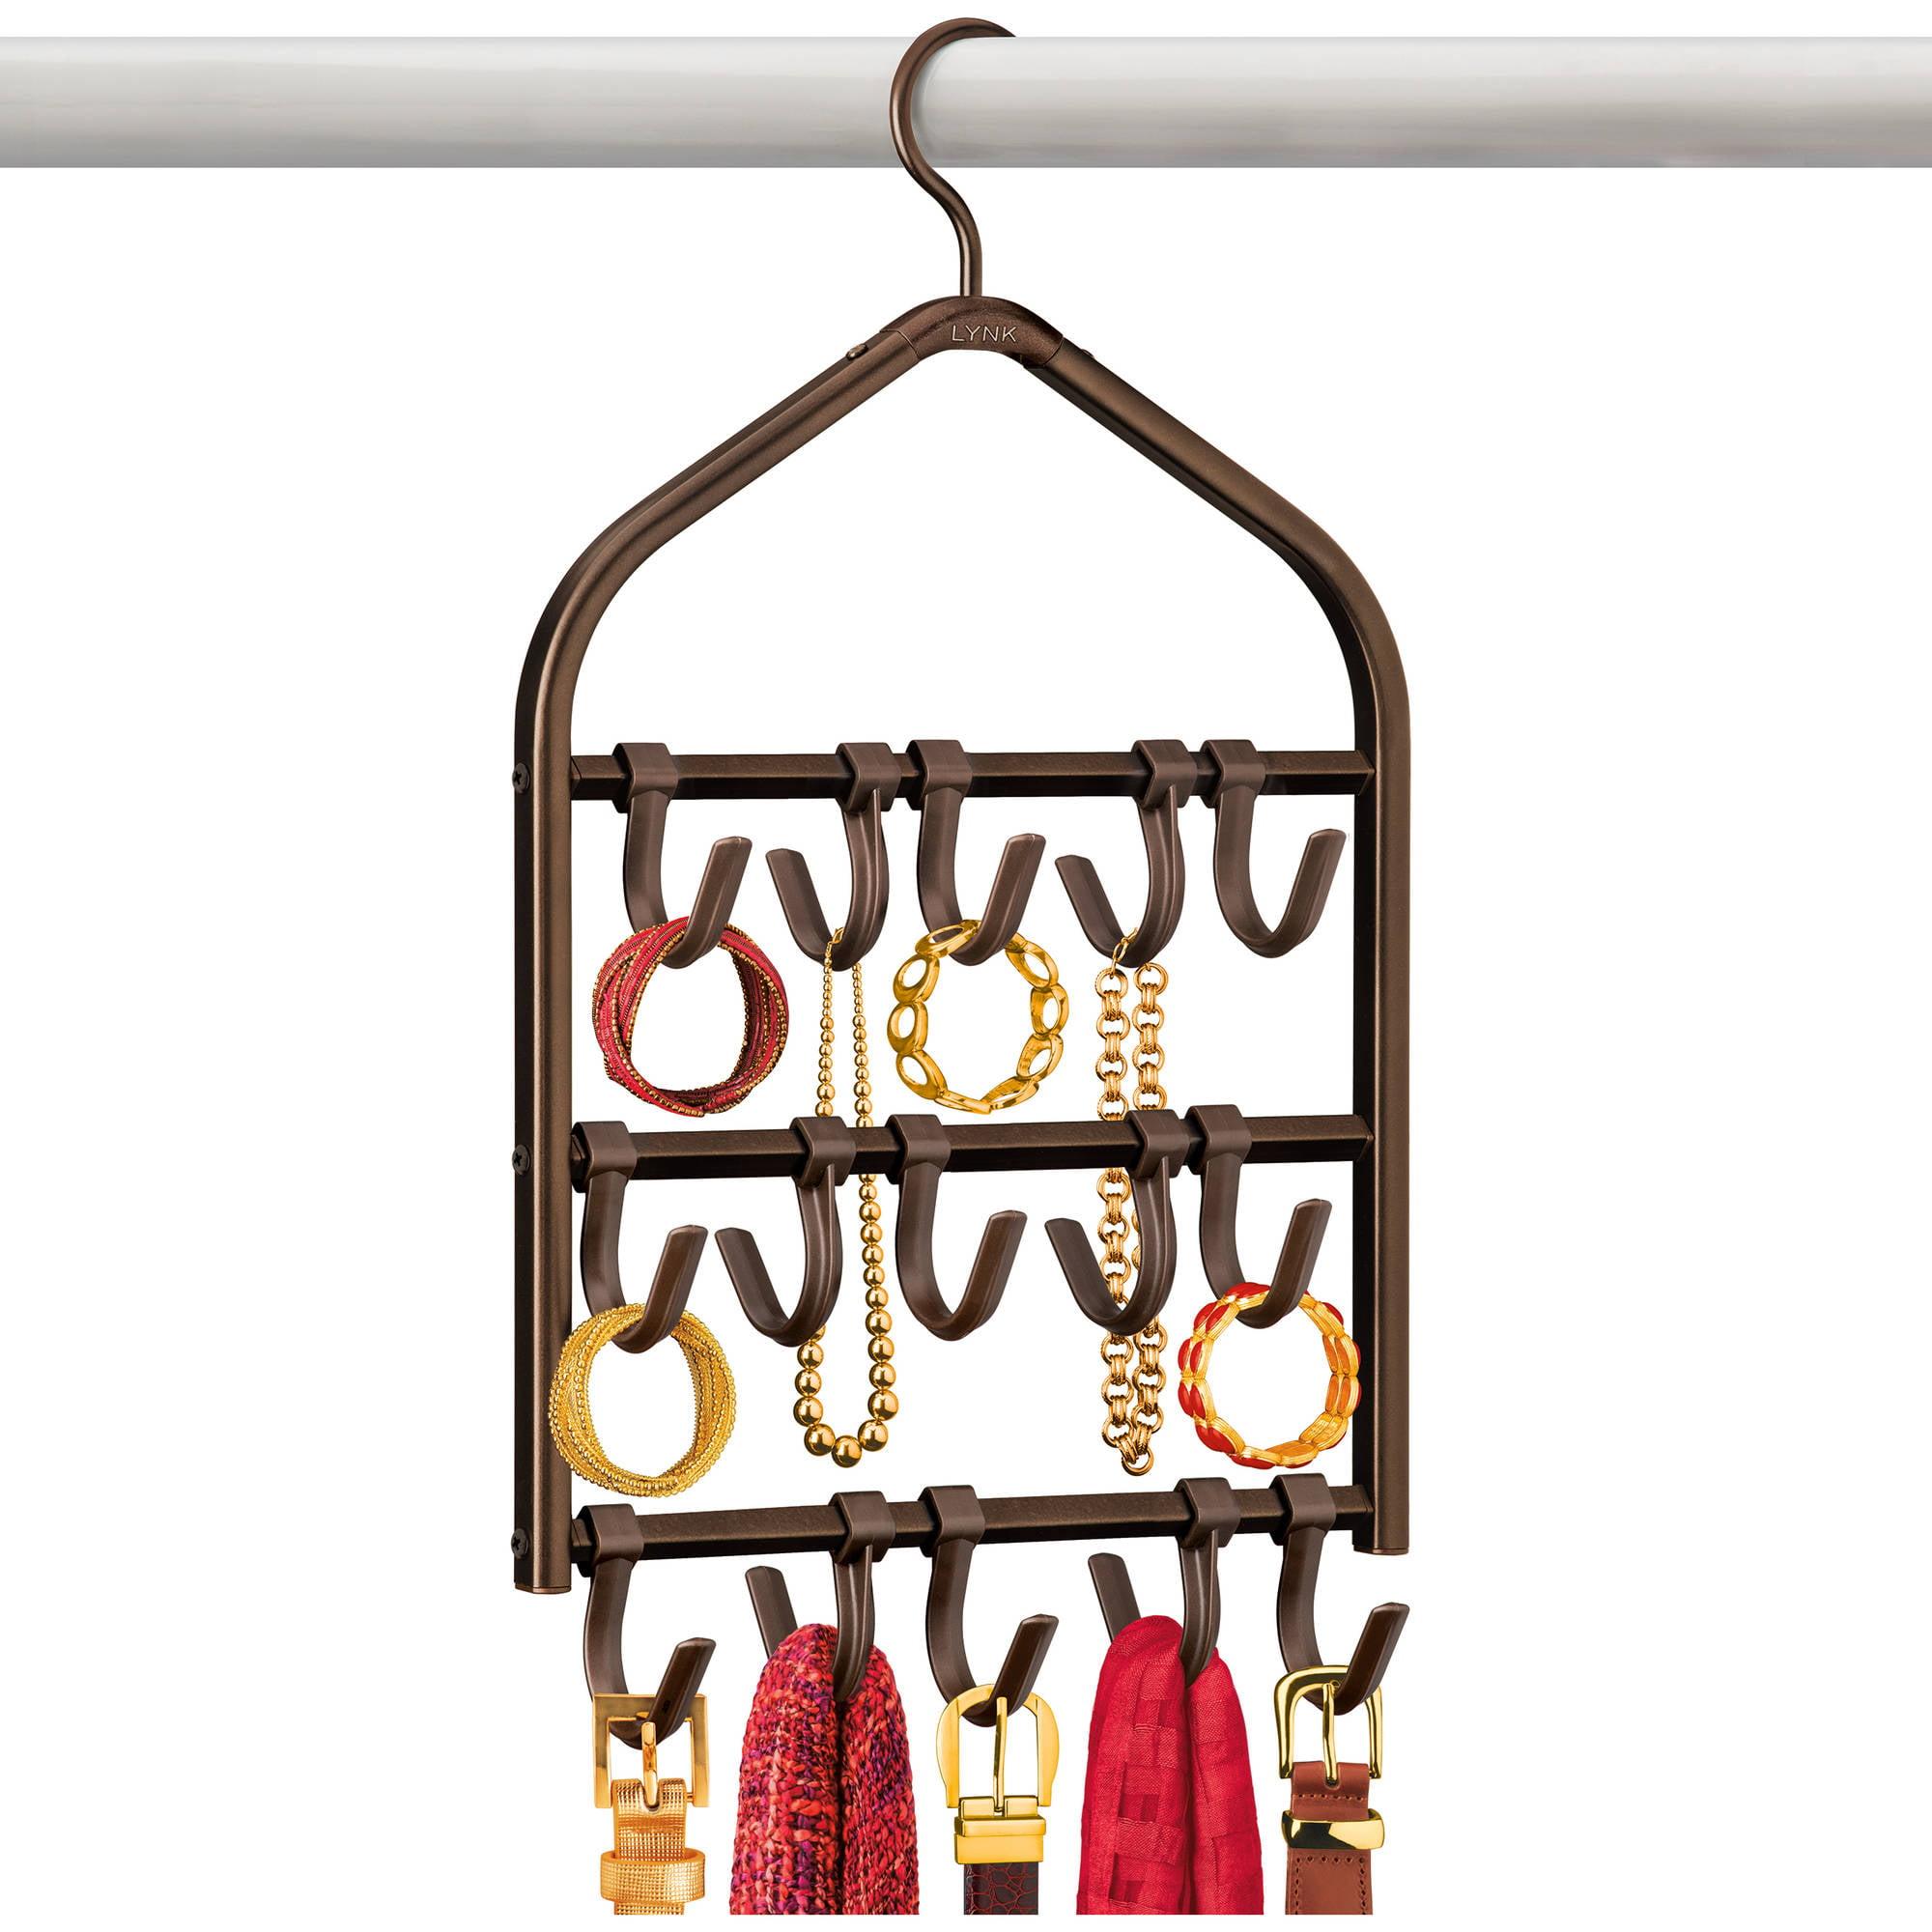 Lynk Double Sided Scarf Hanger, Belt, Hat, Jewelry, Accessory Holder, 15 Hook Closet Organizer Rack, Bronze